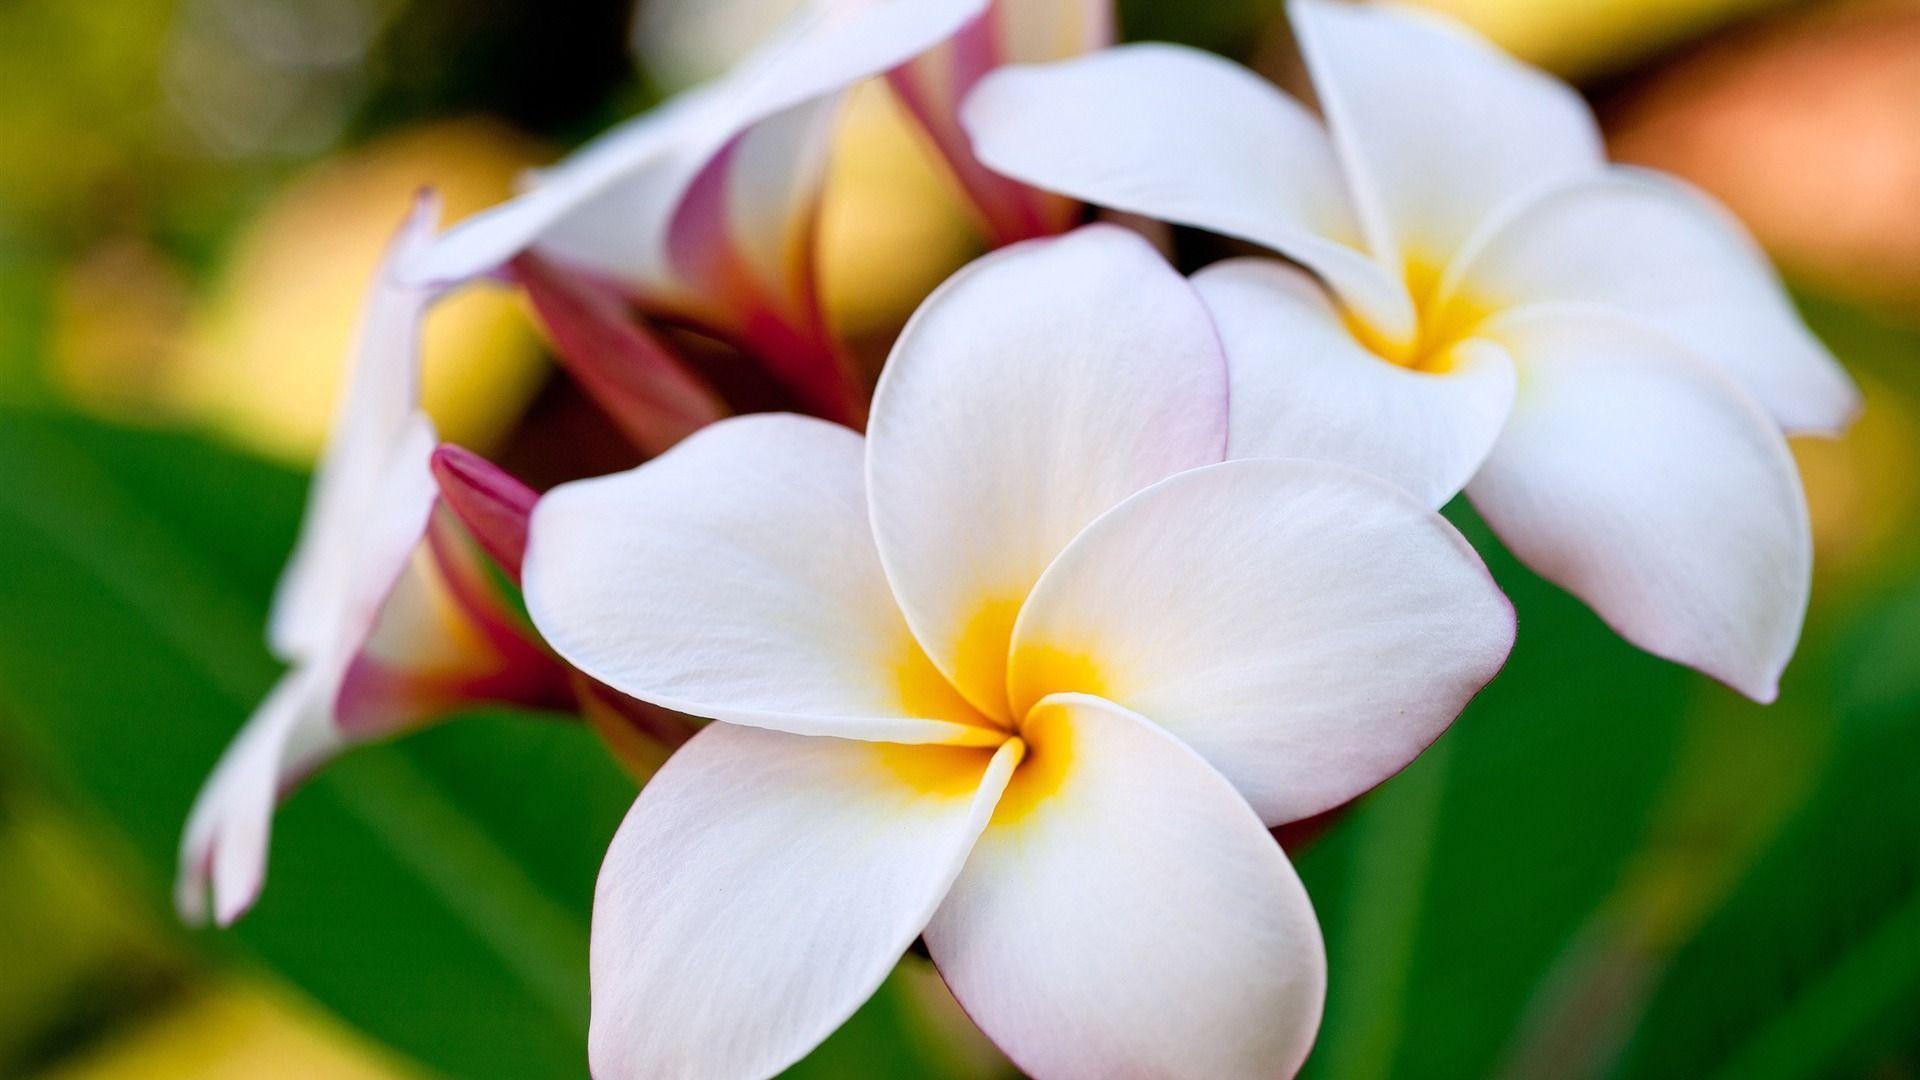 Hawaiian Flower Wallpapers - Wallpaper Cave